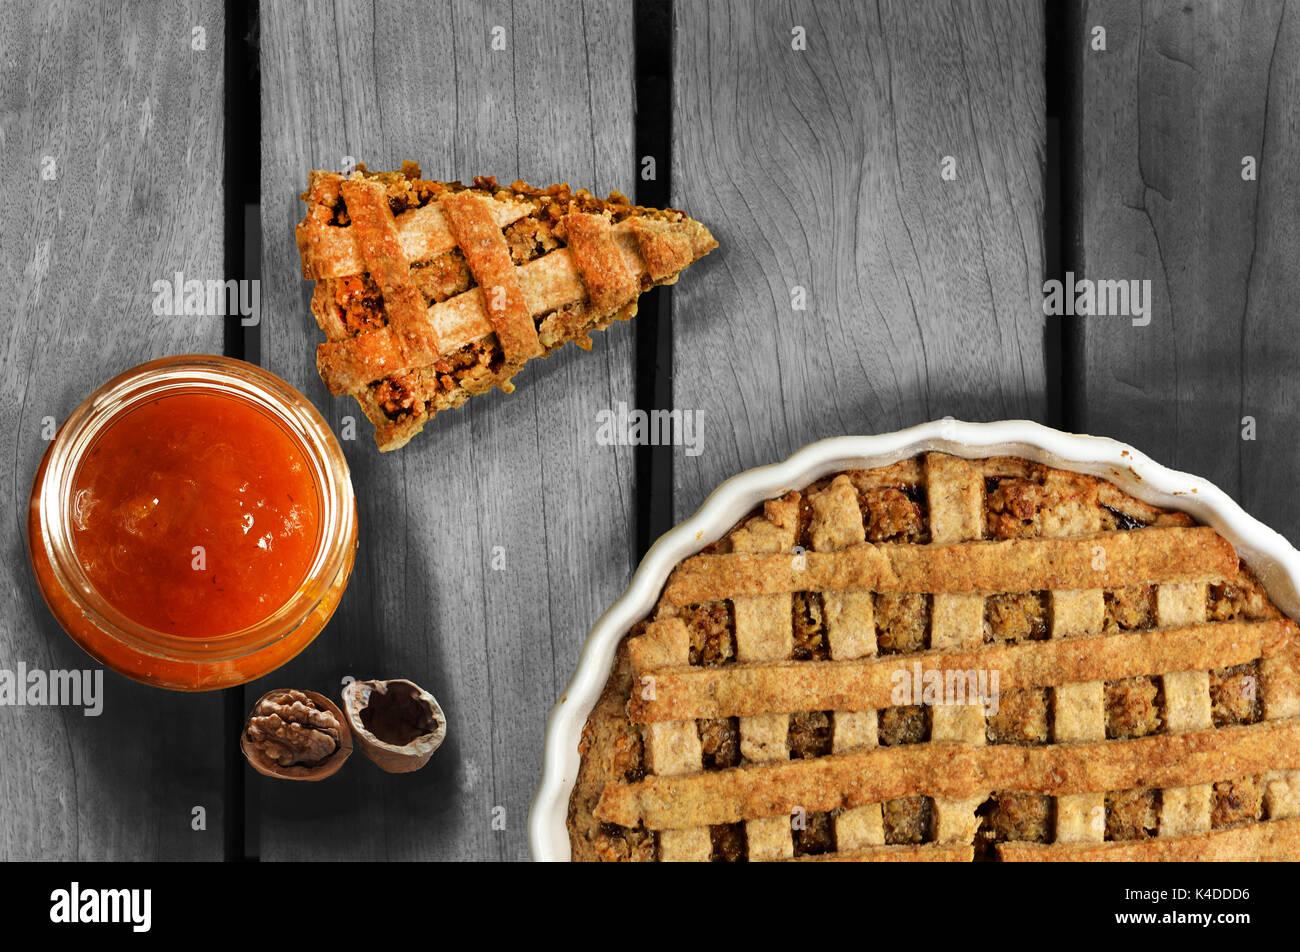 Walnut Pie and Homemade jam - Stock Image